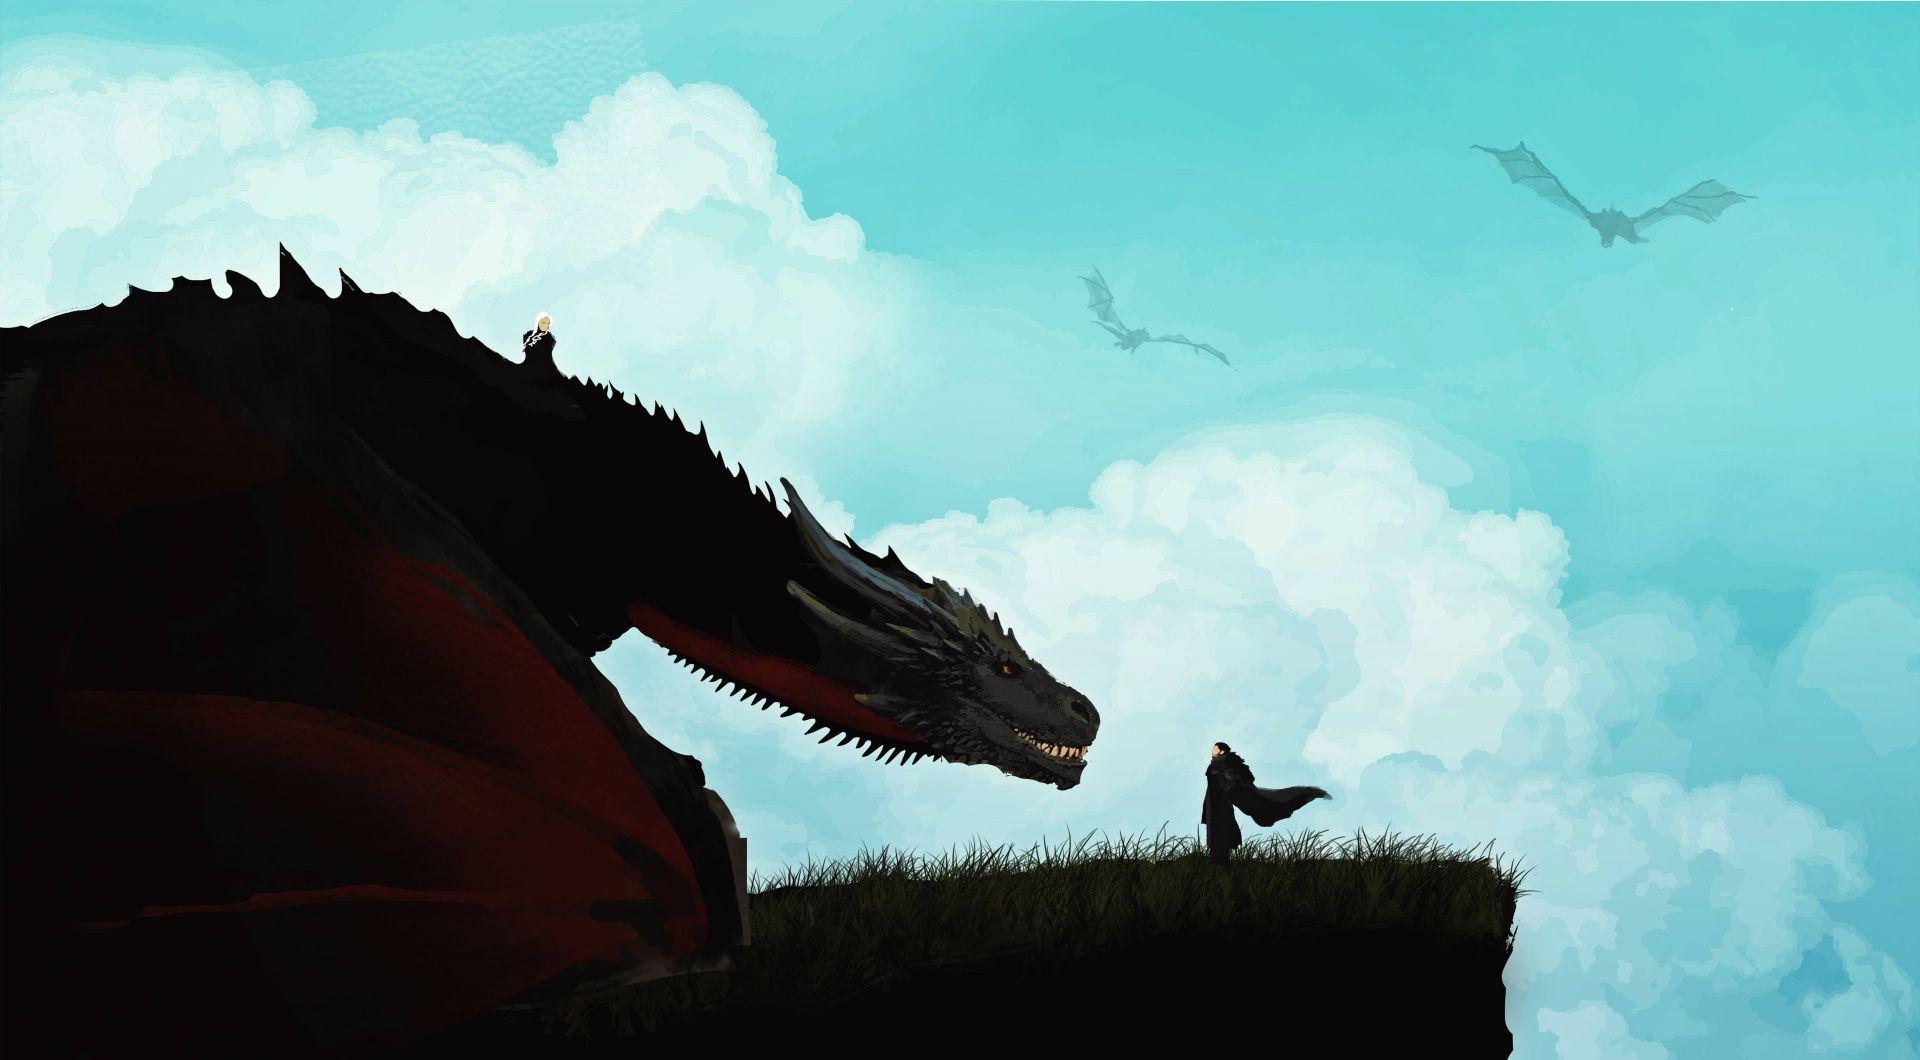 Jon Snow and Dragon art minimalist